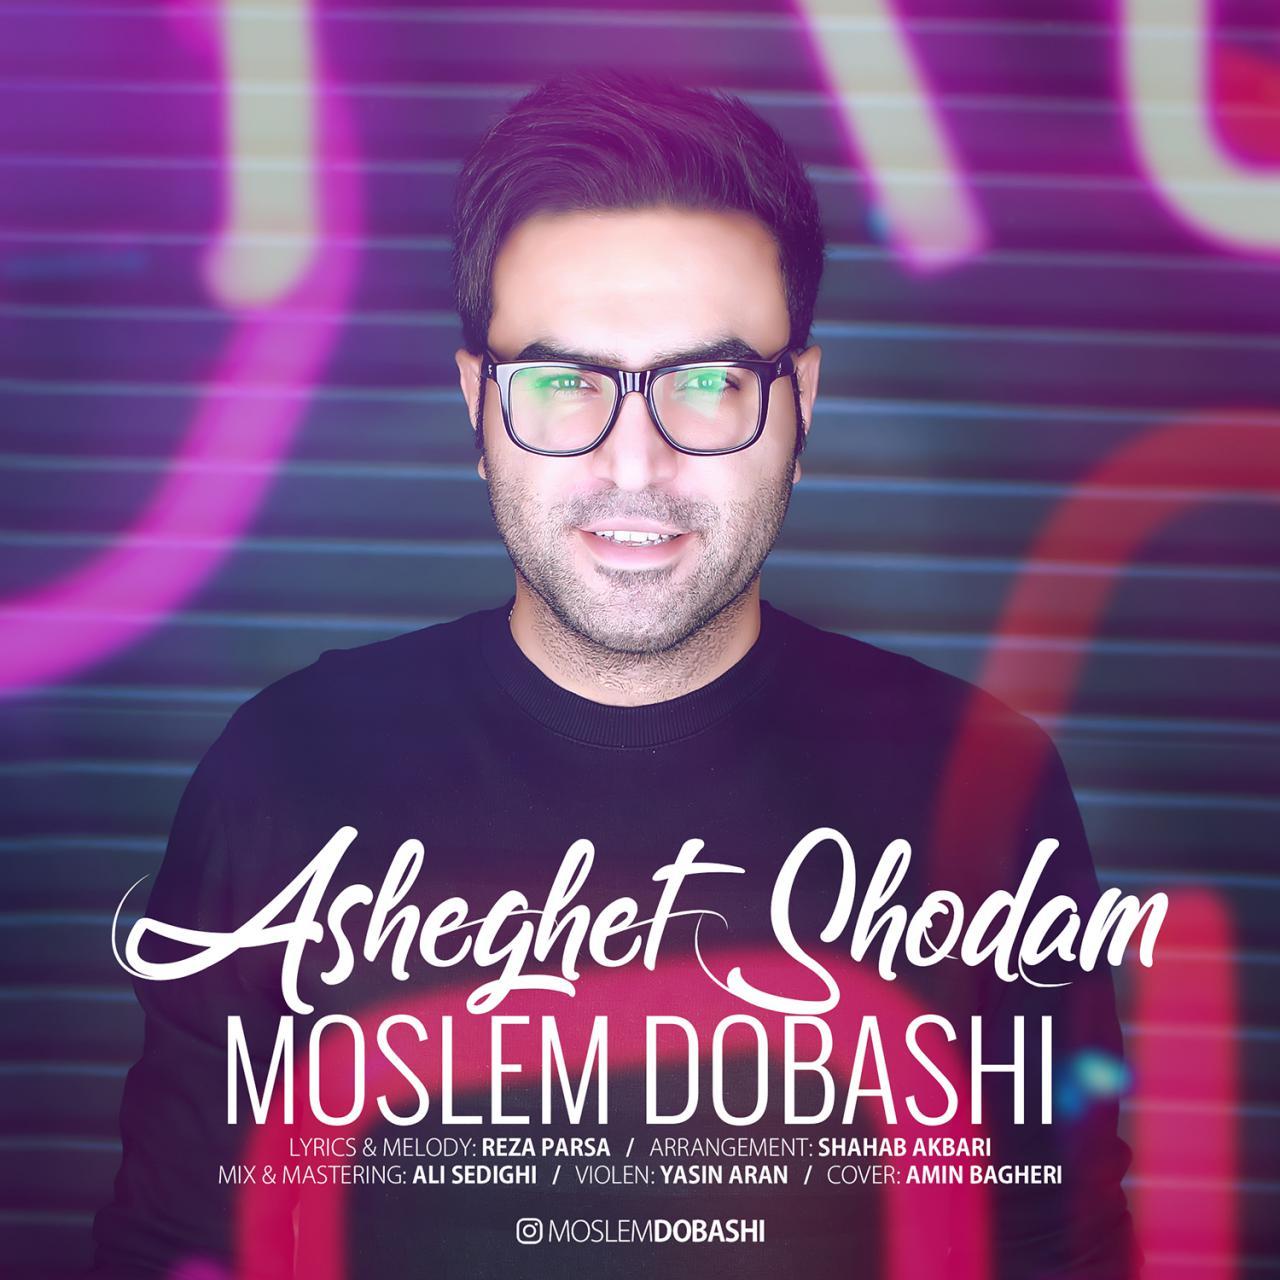 مسلم دوباشی عاشقت شدم Moslem Dobashi Asheghet Shodam